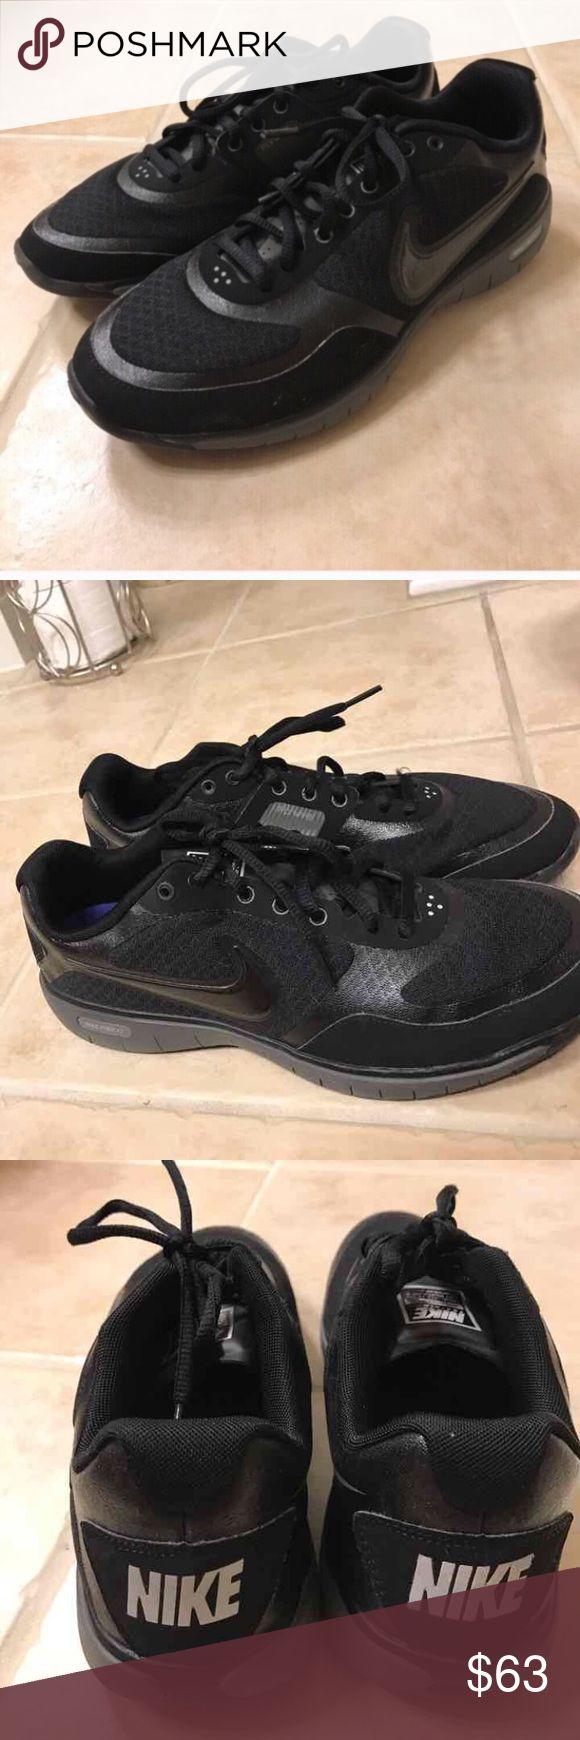 Nike free size 8 all black XT sneakers Nike free size 8 all black XT sneakers Nike Shoes Sneakers